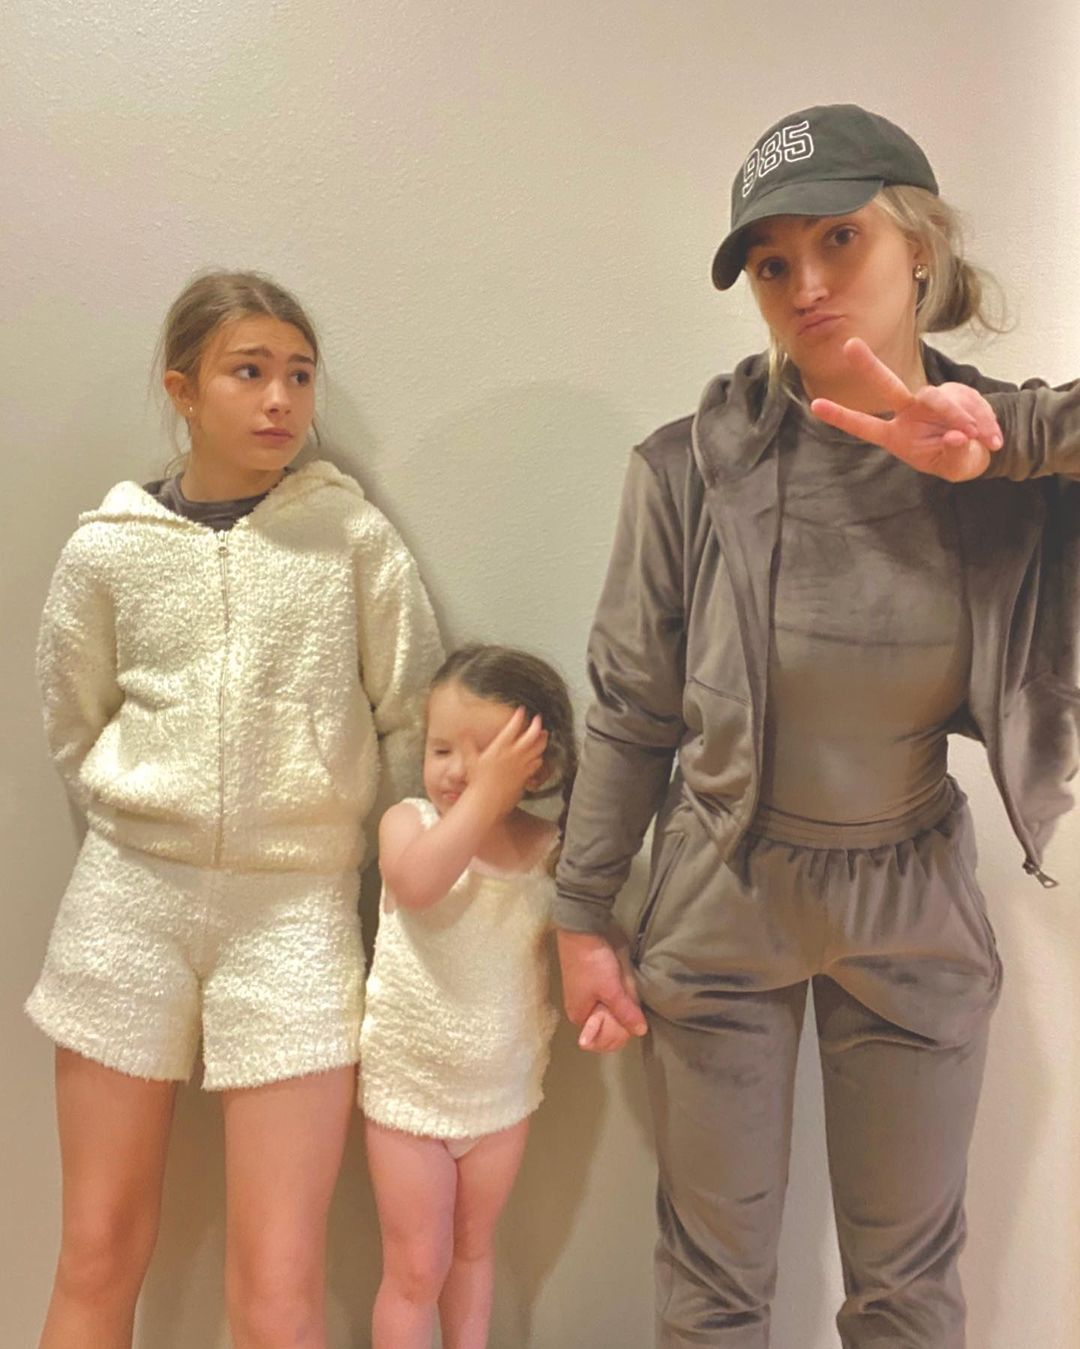 Jamie Lynn Spears and girls indoors